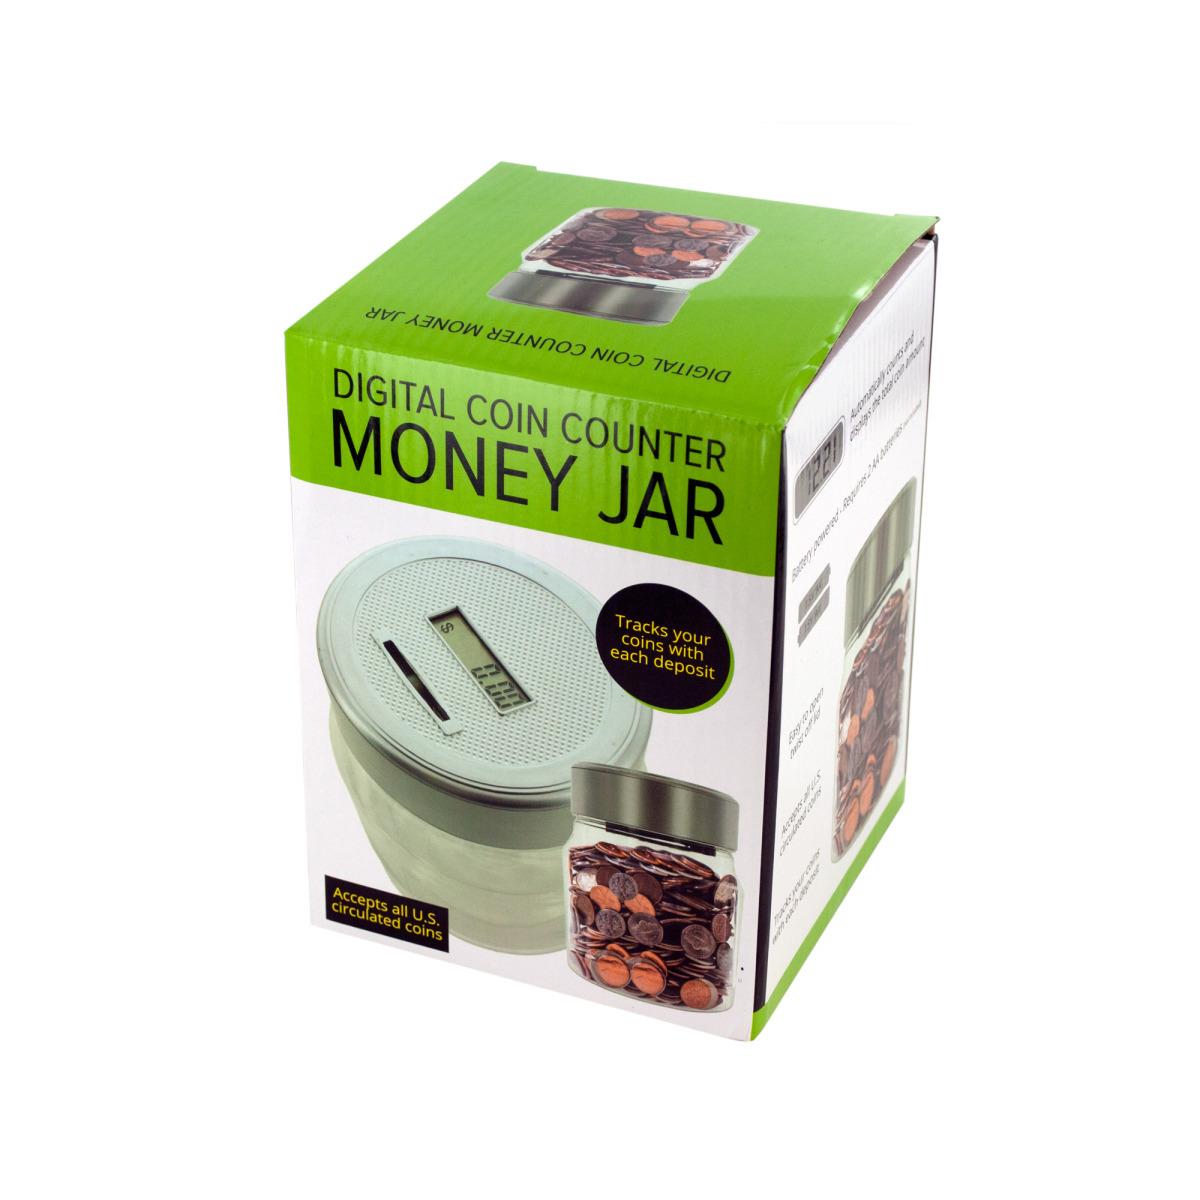 Digital Coin Counter Money Jar [1942859]